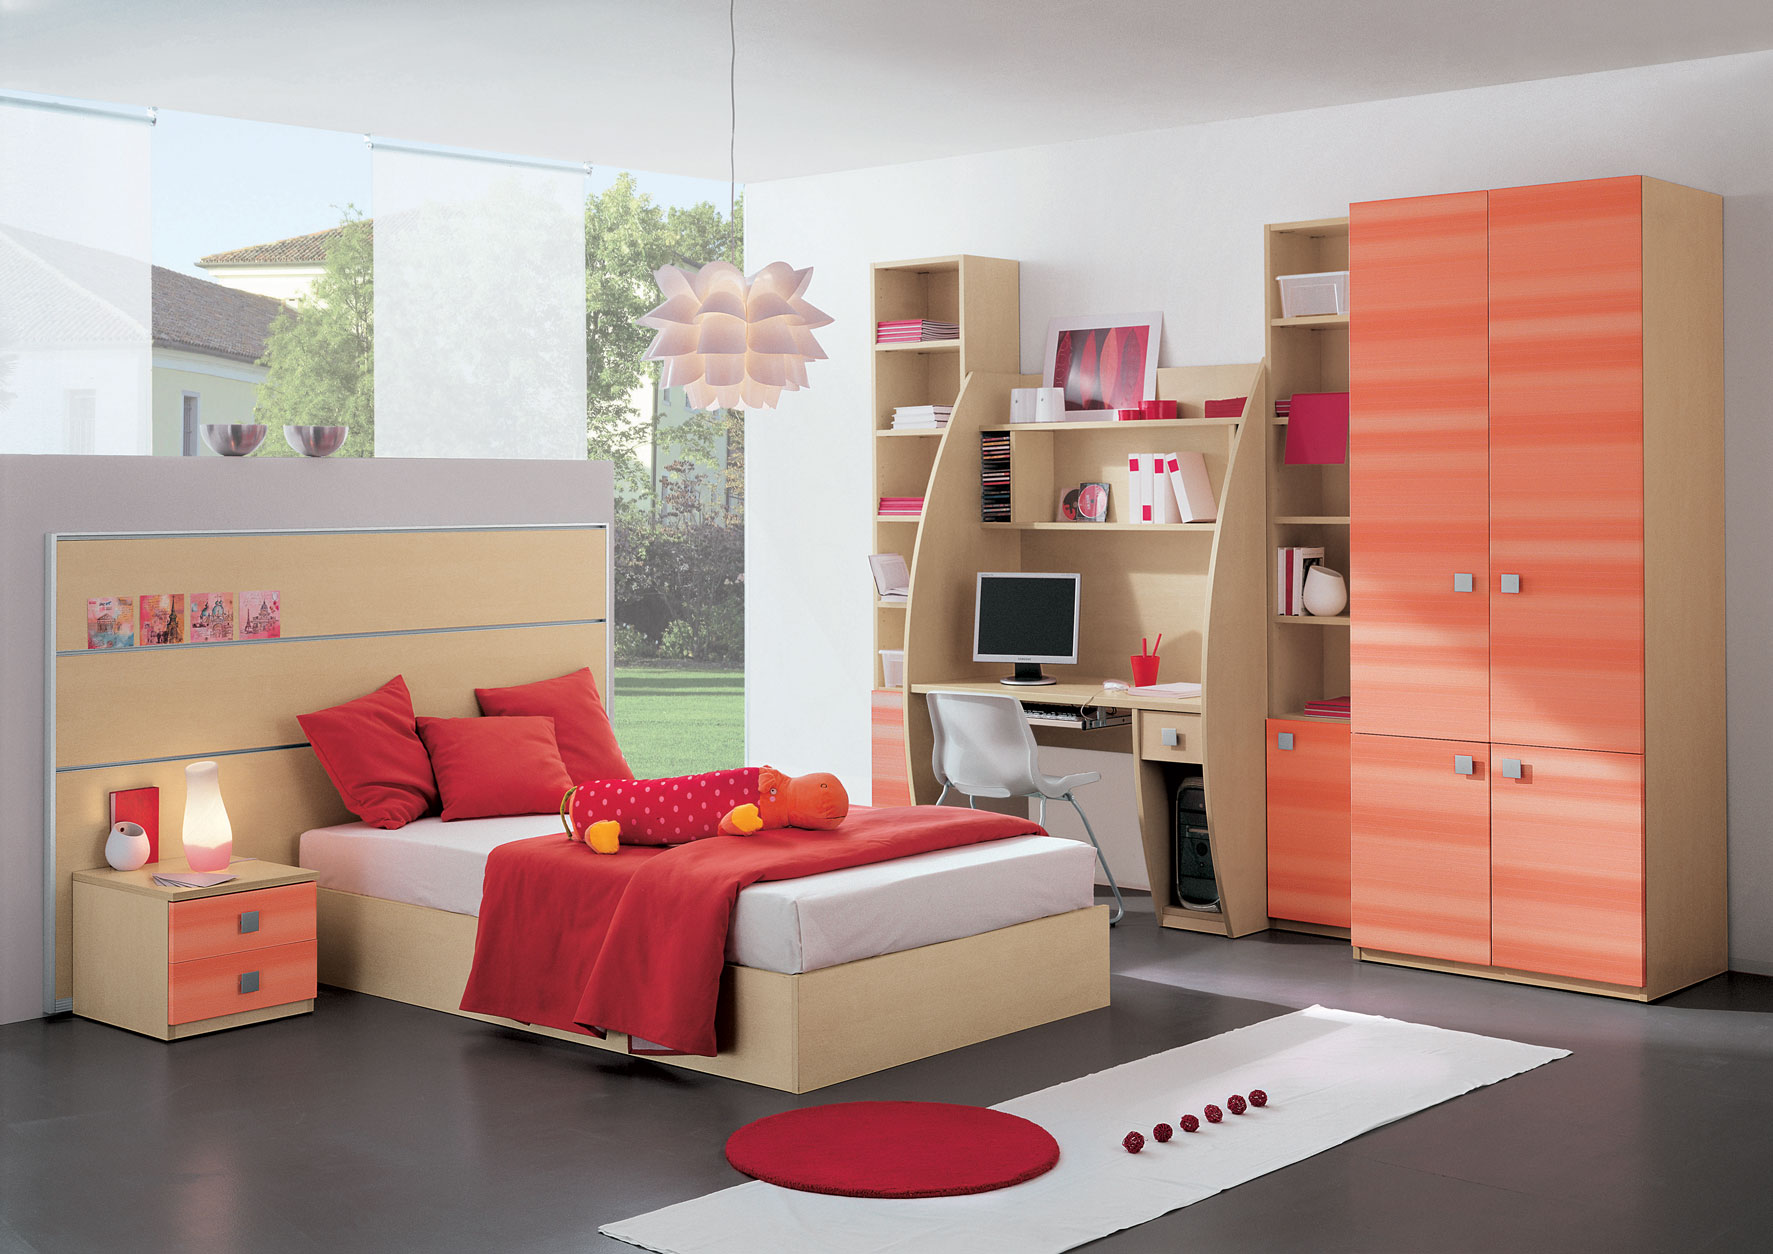 kids-bedroom-traditional-kids-room-designs-traditional-childrens-bedrooms